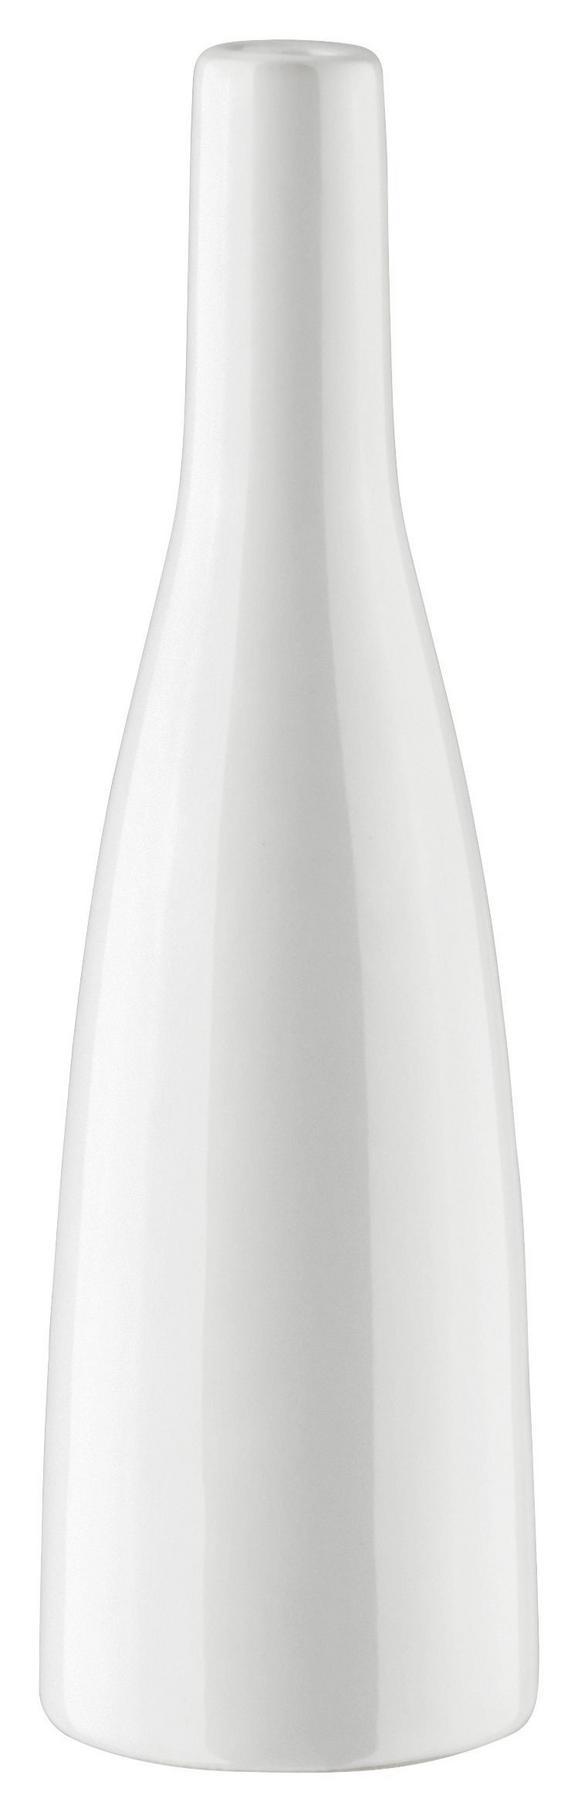 Vase Plancio Weiß - Weiß, MODERN, Keramik (20.5cm) - Mömax modern living